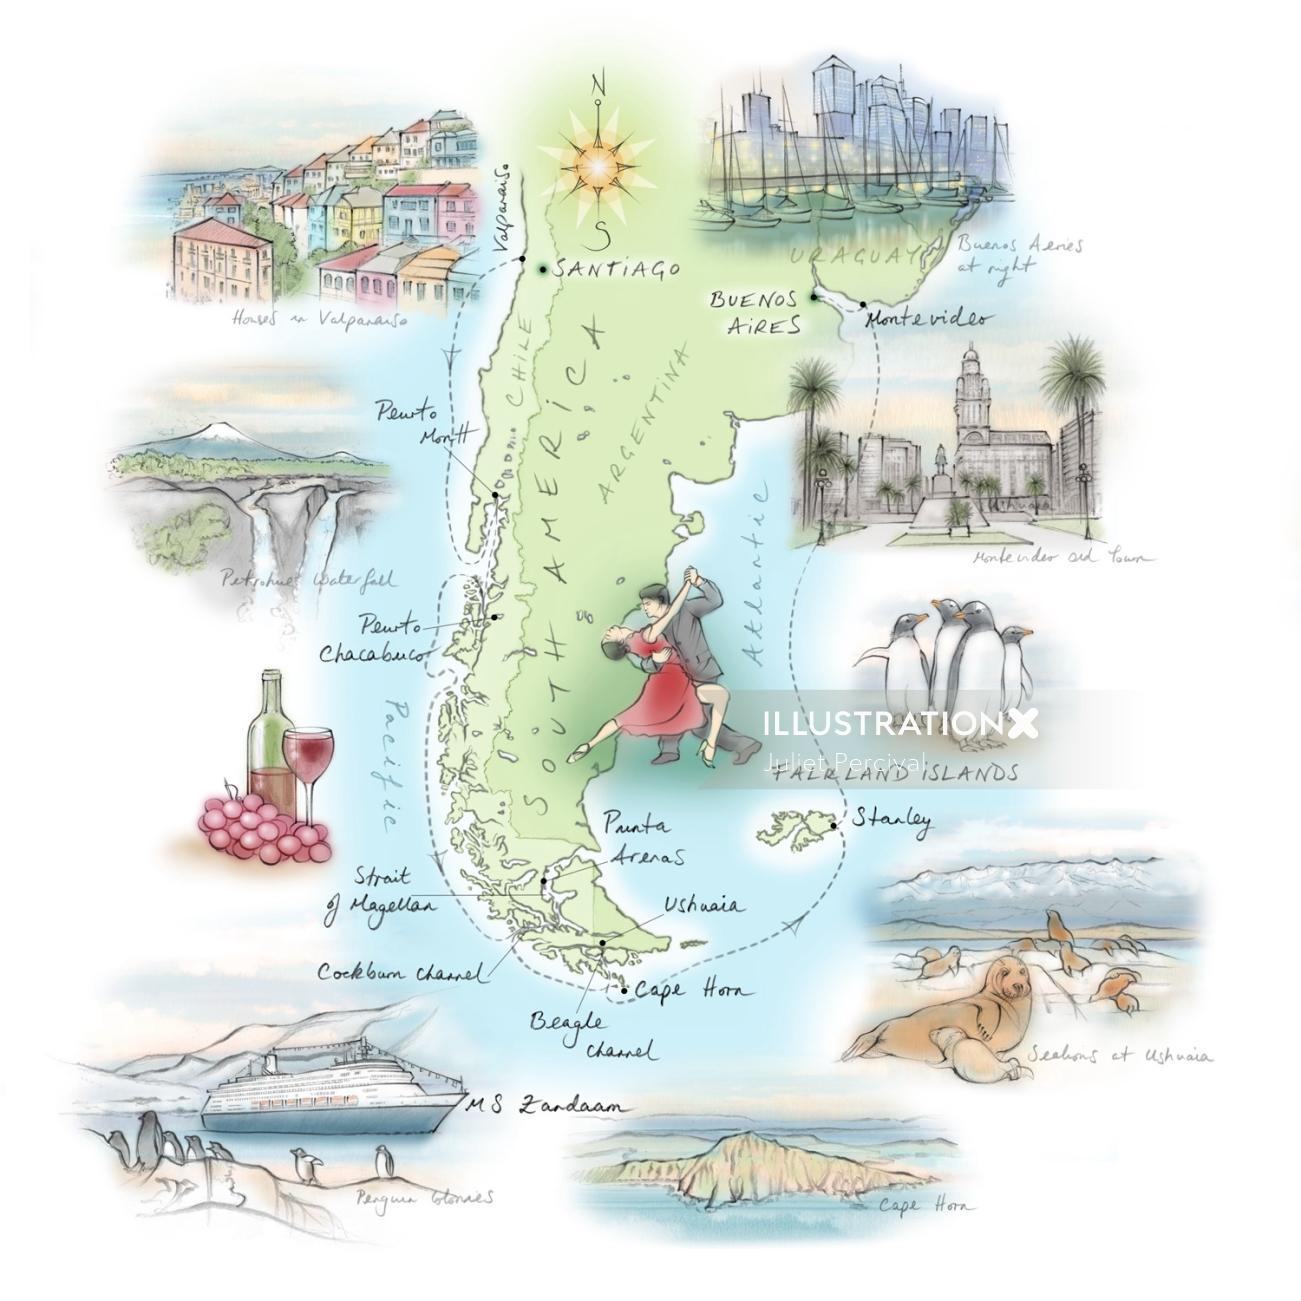 Such America, Cape Horn, Santiago,  Buenos Aires